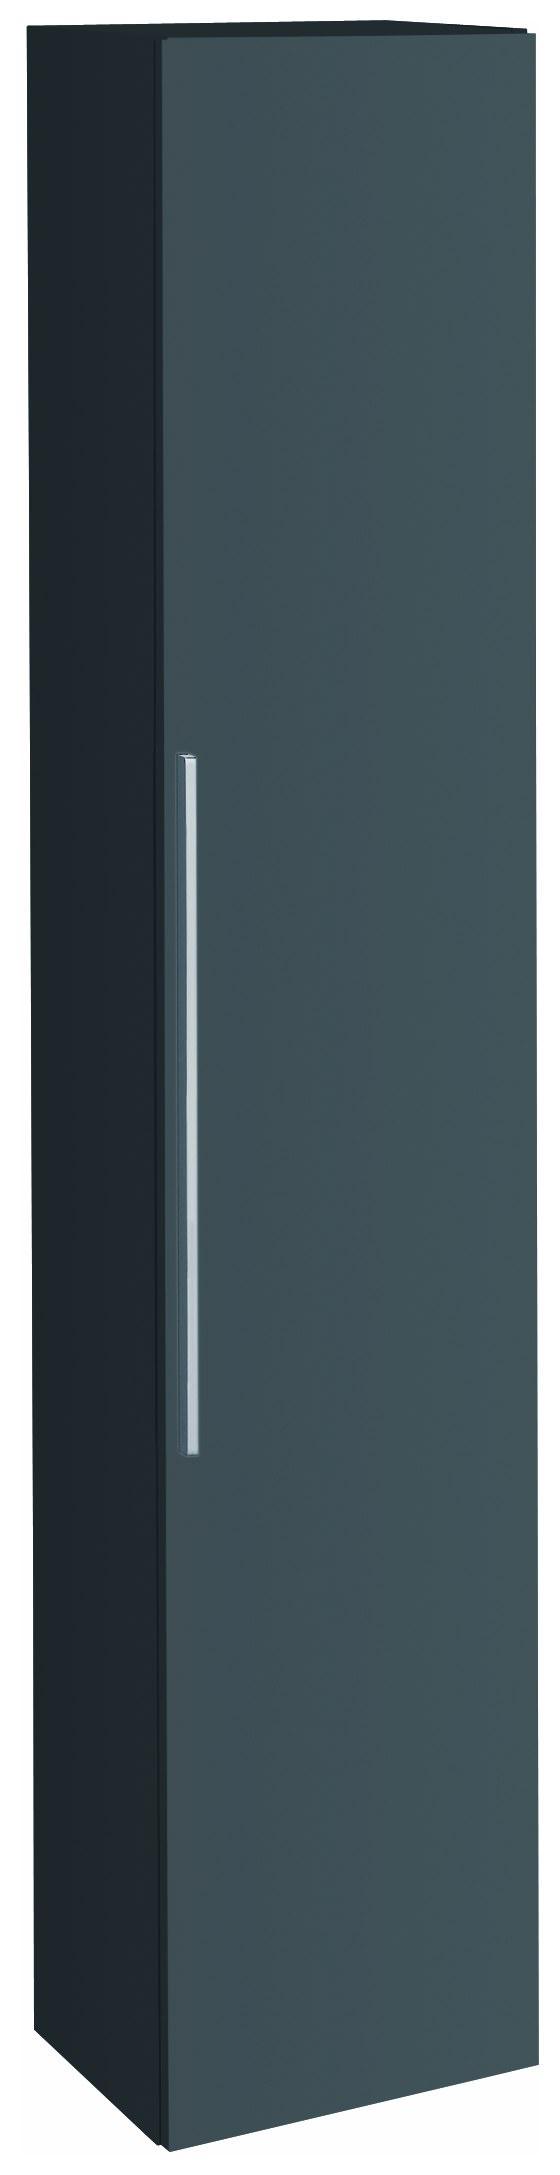 keramag icon hochschrank 360x1800x292mm lava matt 841001000. Black Bedroom Furniture Sets. Home Design Ideas